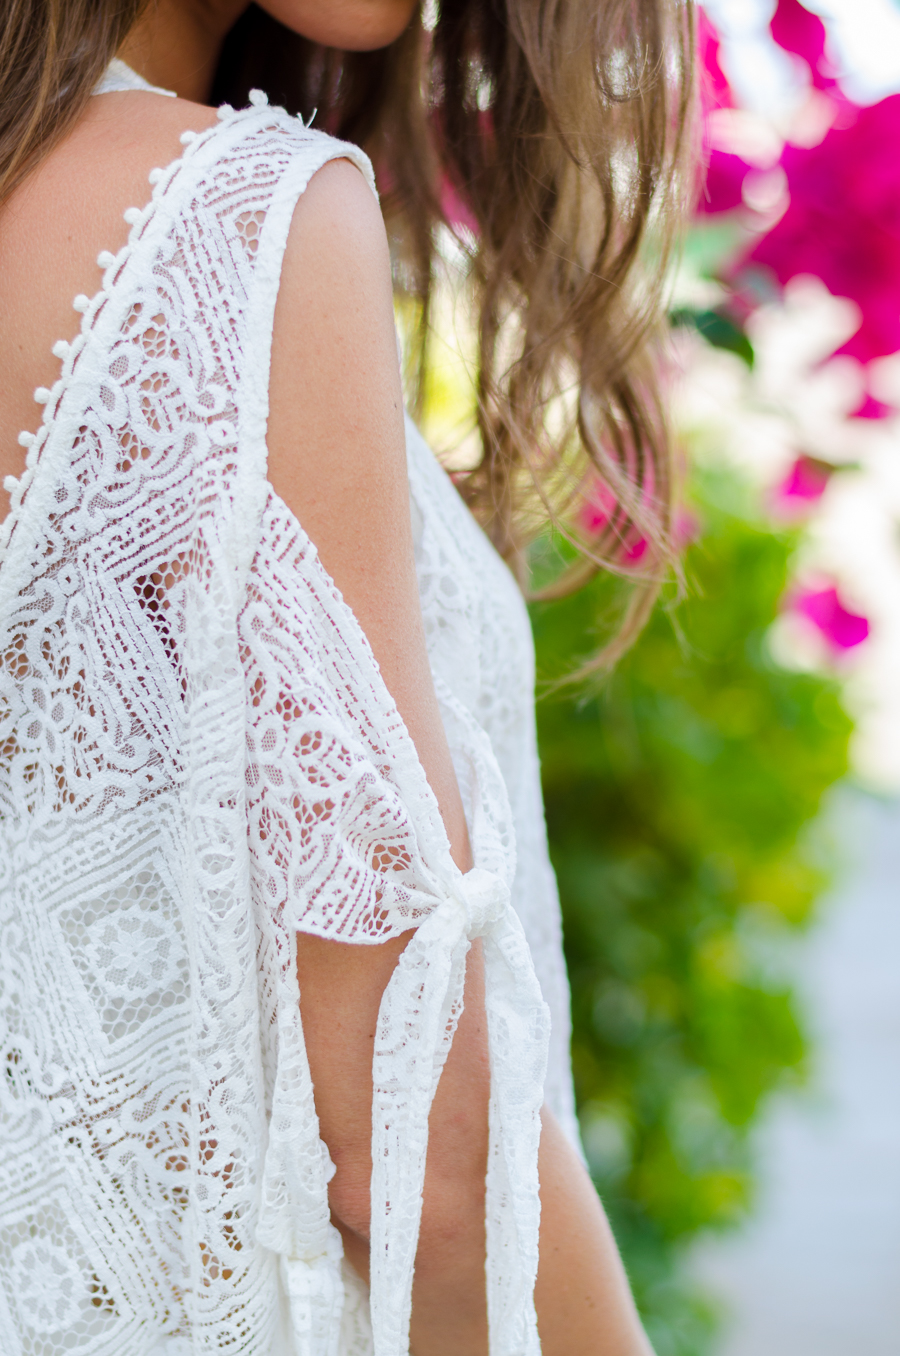 boho lace dress gladiator sandals and fringe bag romantic summer outfit